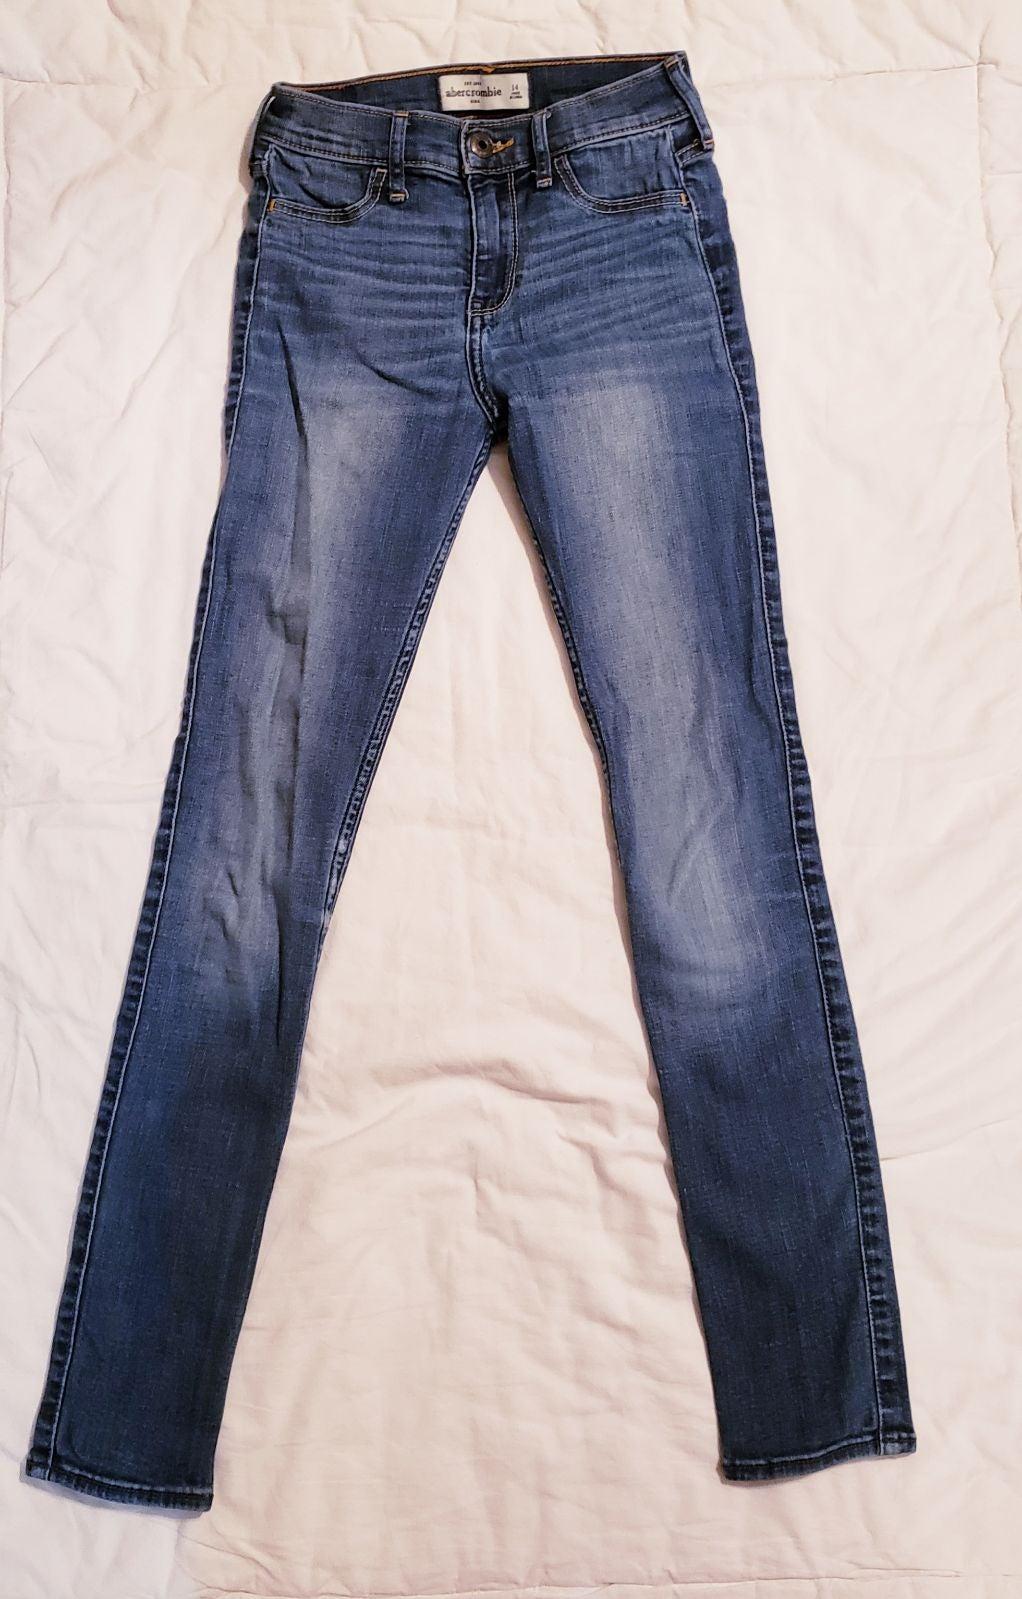 11Abercrombie girls skinny Jeans